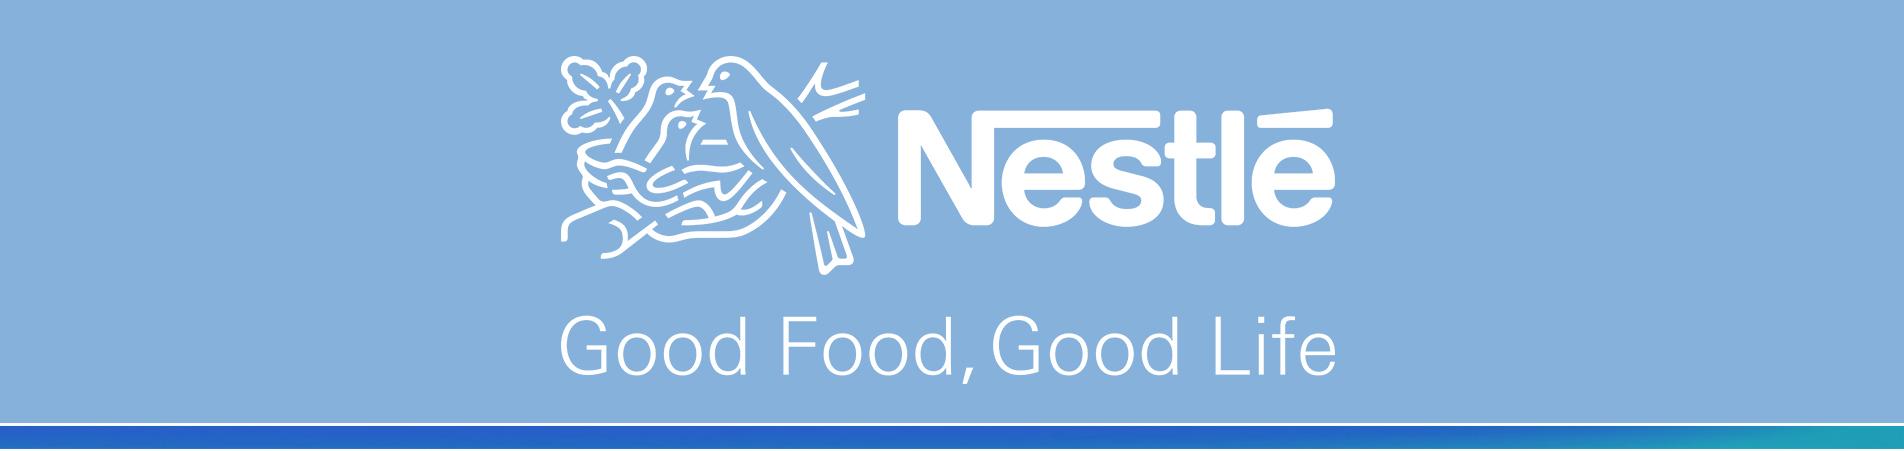 Emme Gel distribuzione surgelati - Nestlé